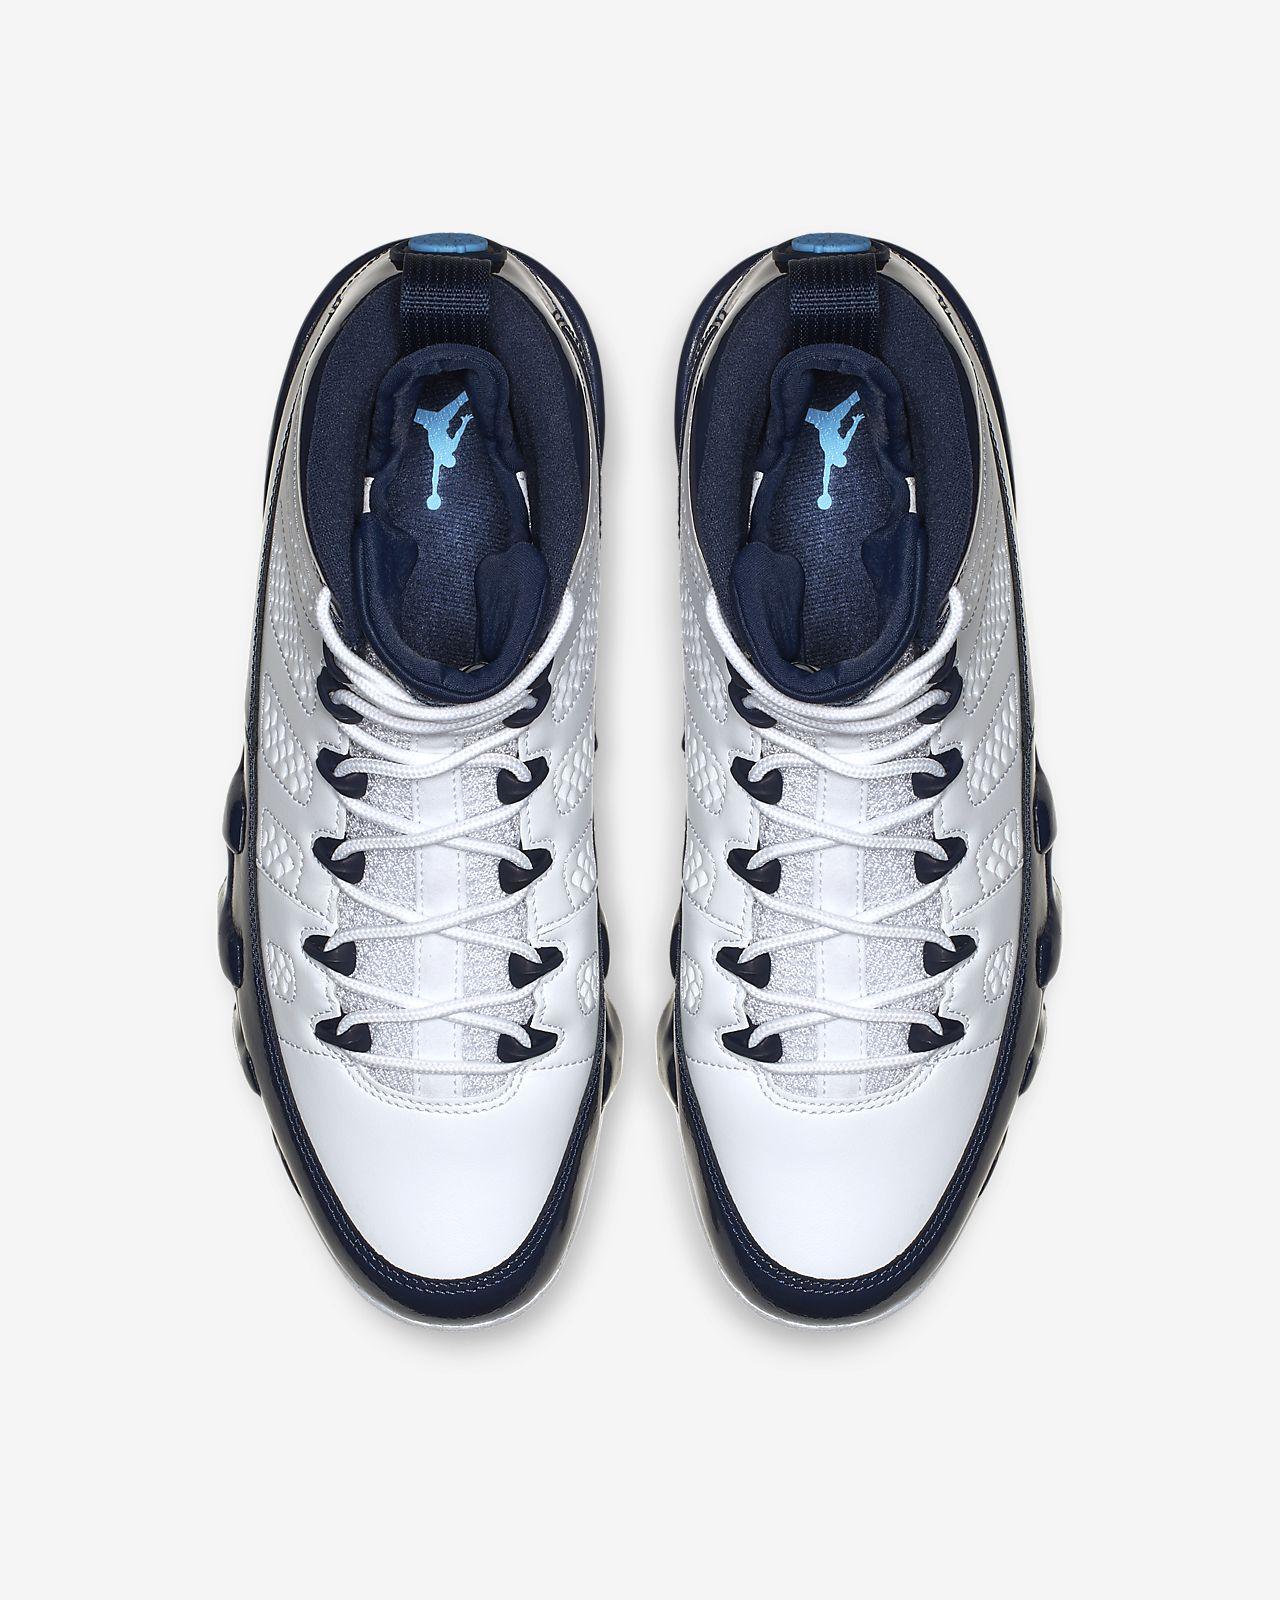 san francisco bc7e3 91c70 ... Air Jordan 9 Retro Men s Shoe